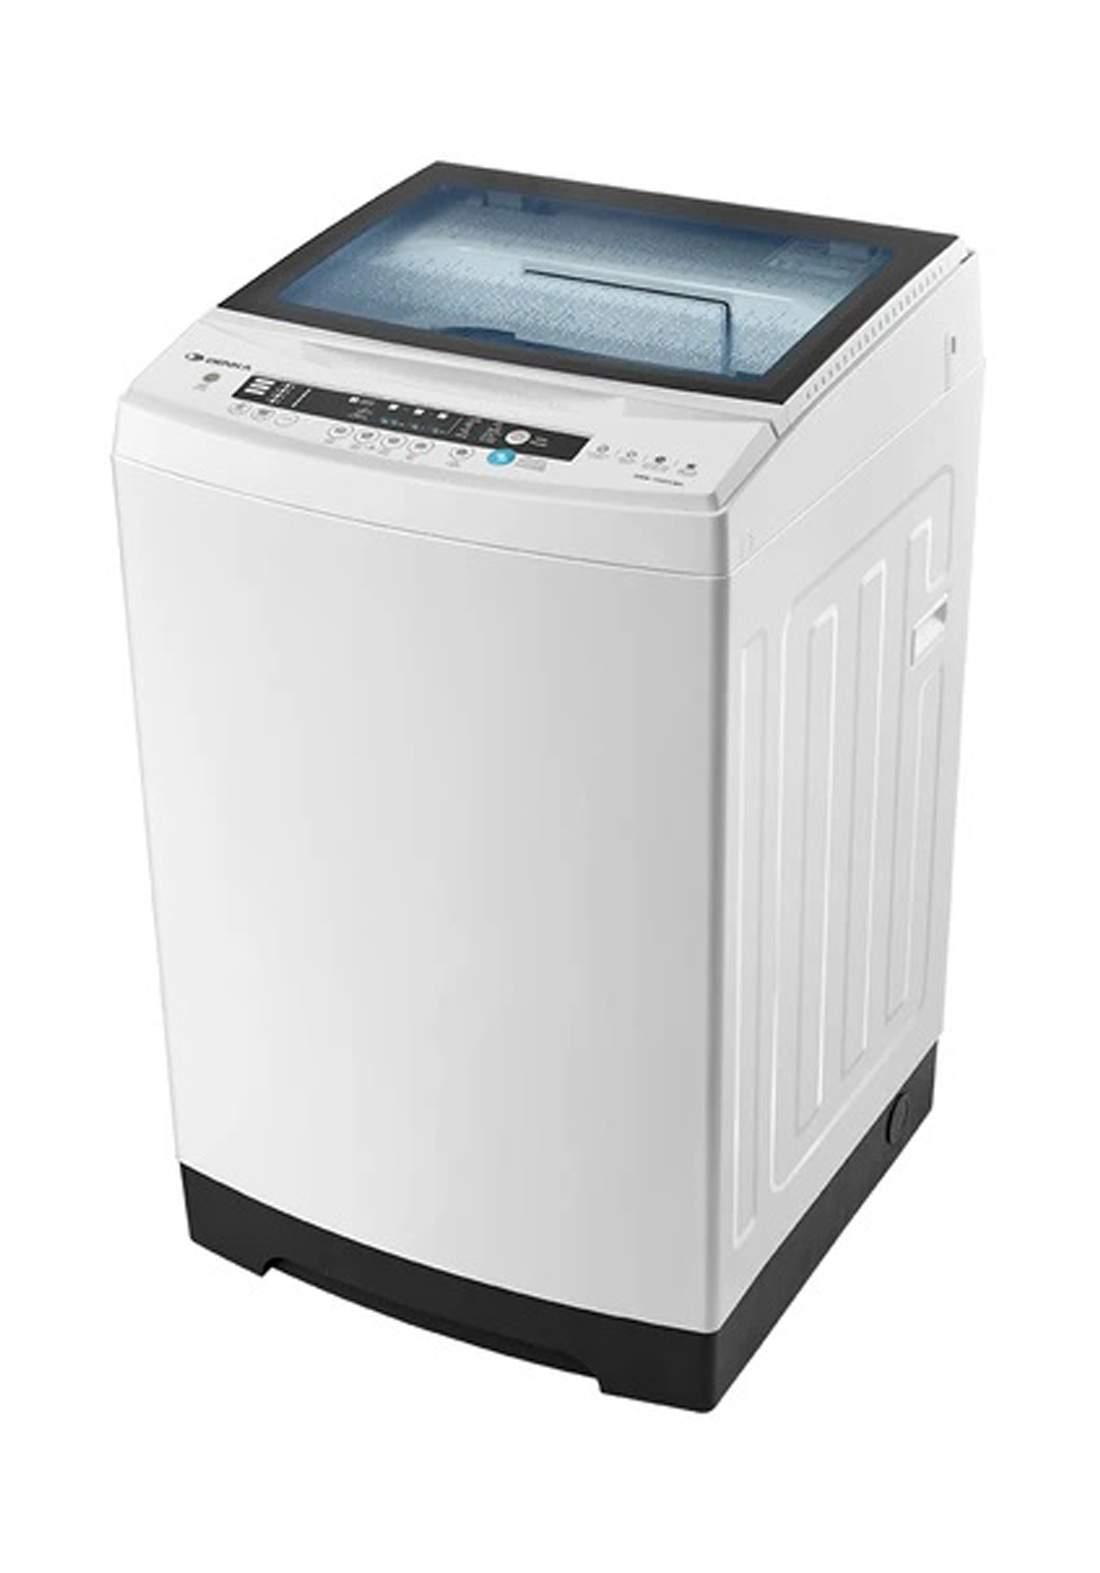 DENKA QWM-1300TLWH washing machine 13kg  غسالة ملابس